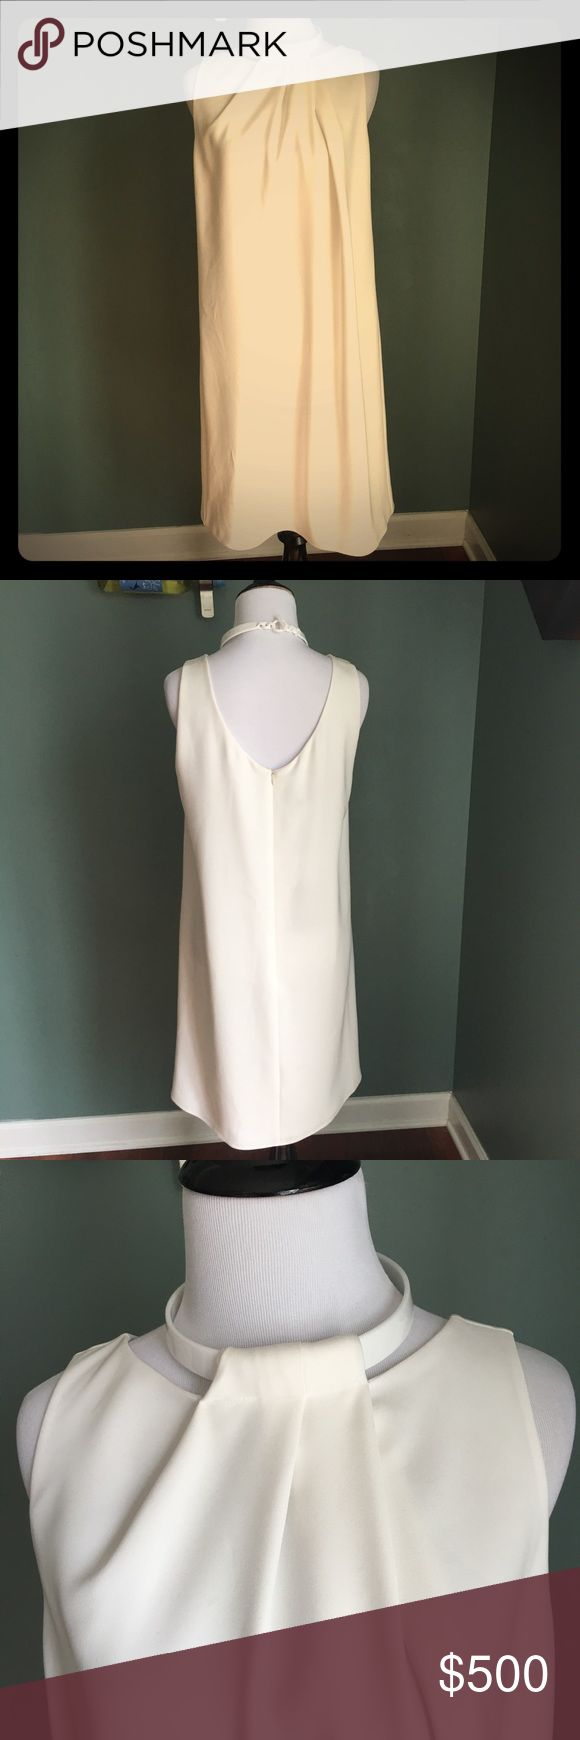 NWT Emporio Armani White Dress NWT Emporio Armani White Dress. Amazing dress. Perfect for spring and summer. Emporio Armani Dresses Midi